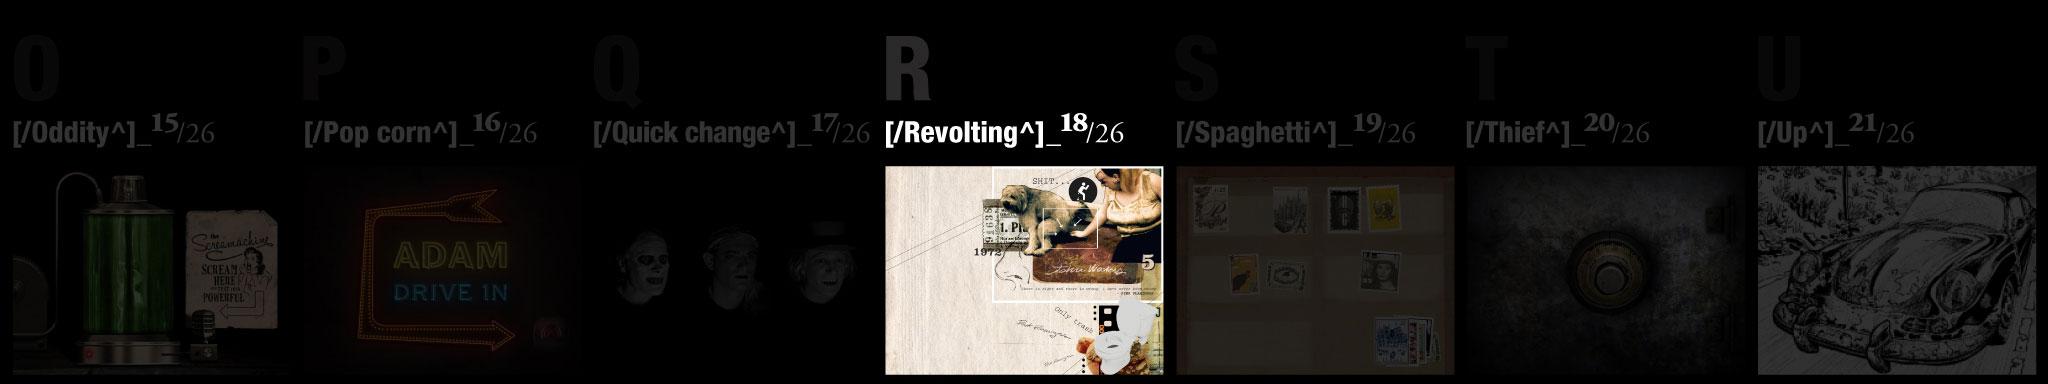 Tavola-sinottica_03_R-Revolting